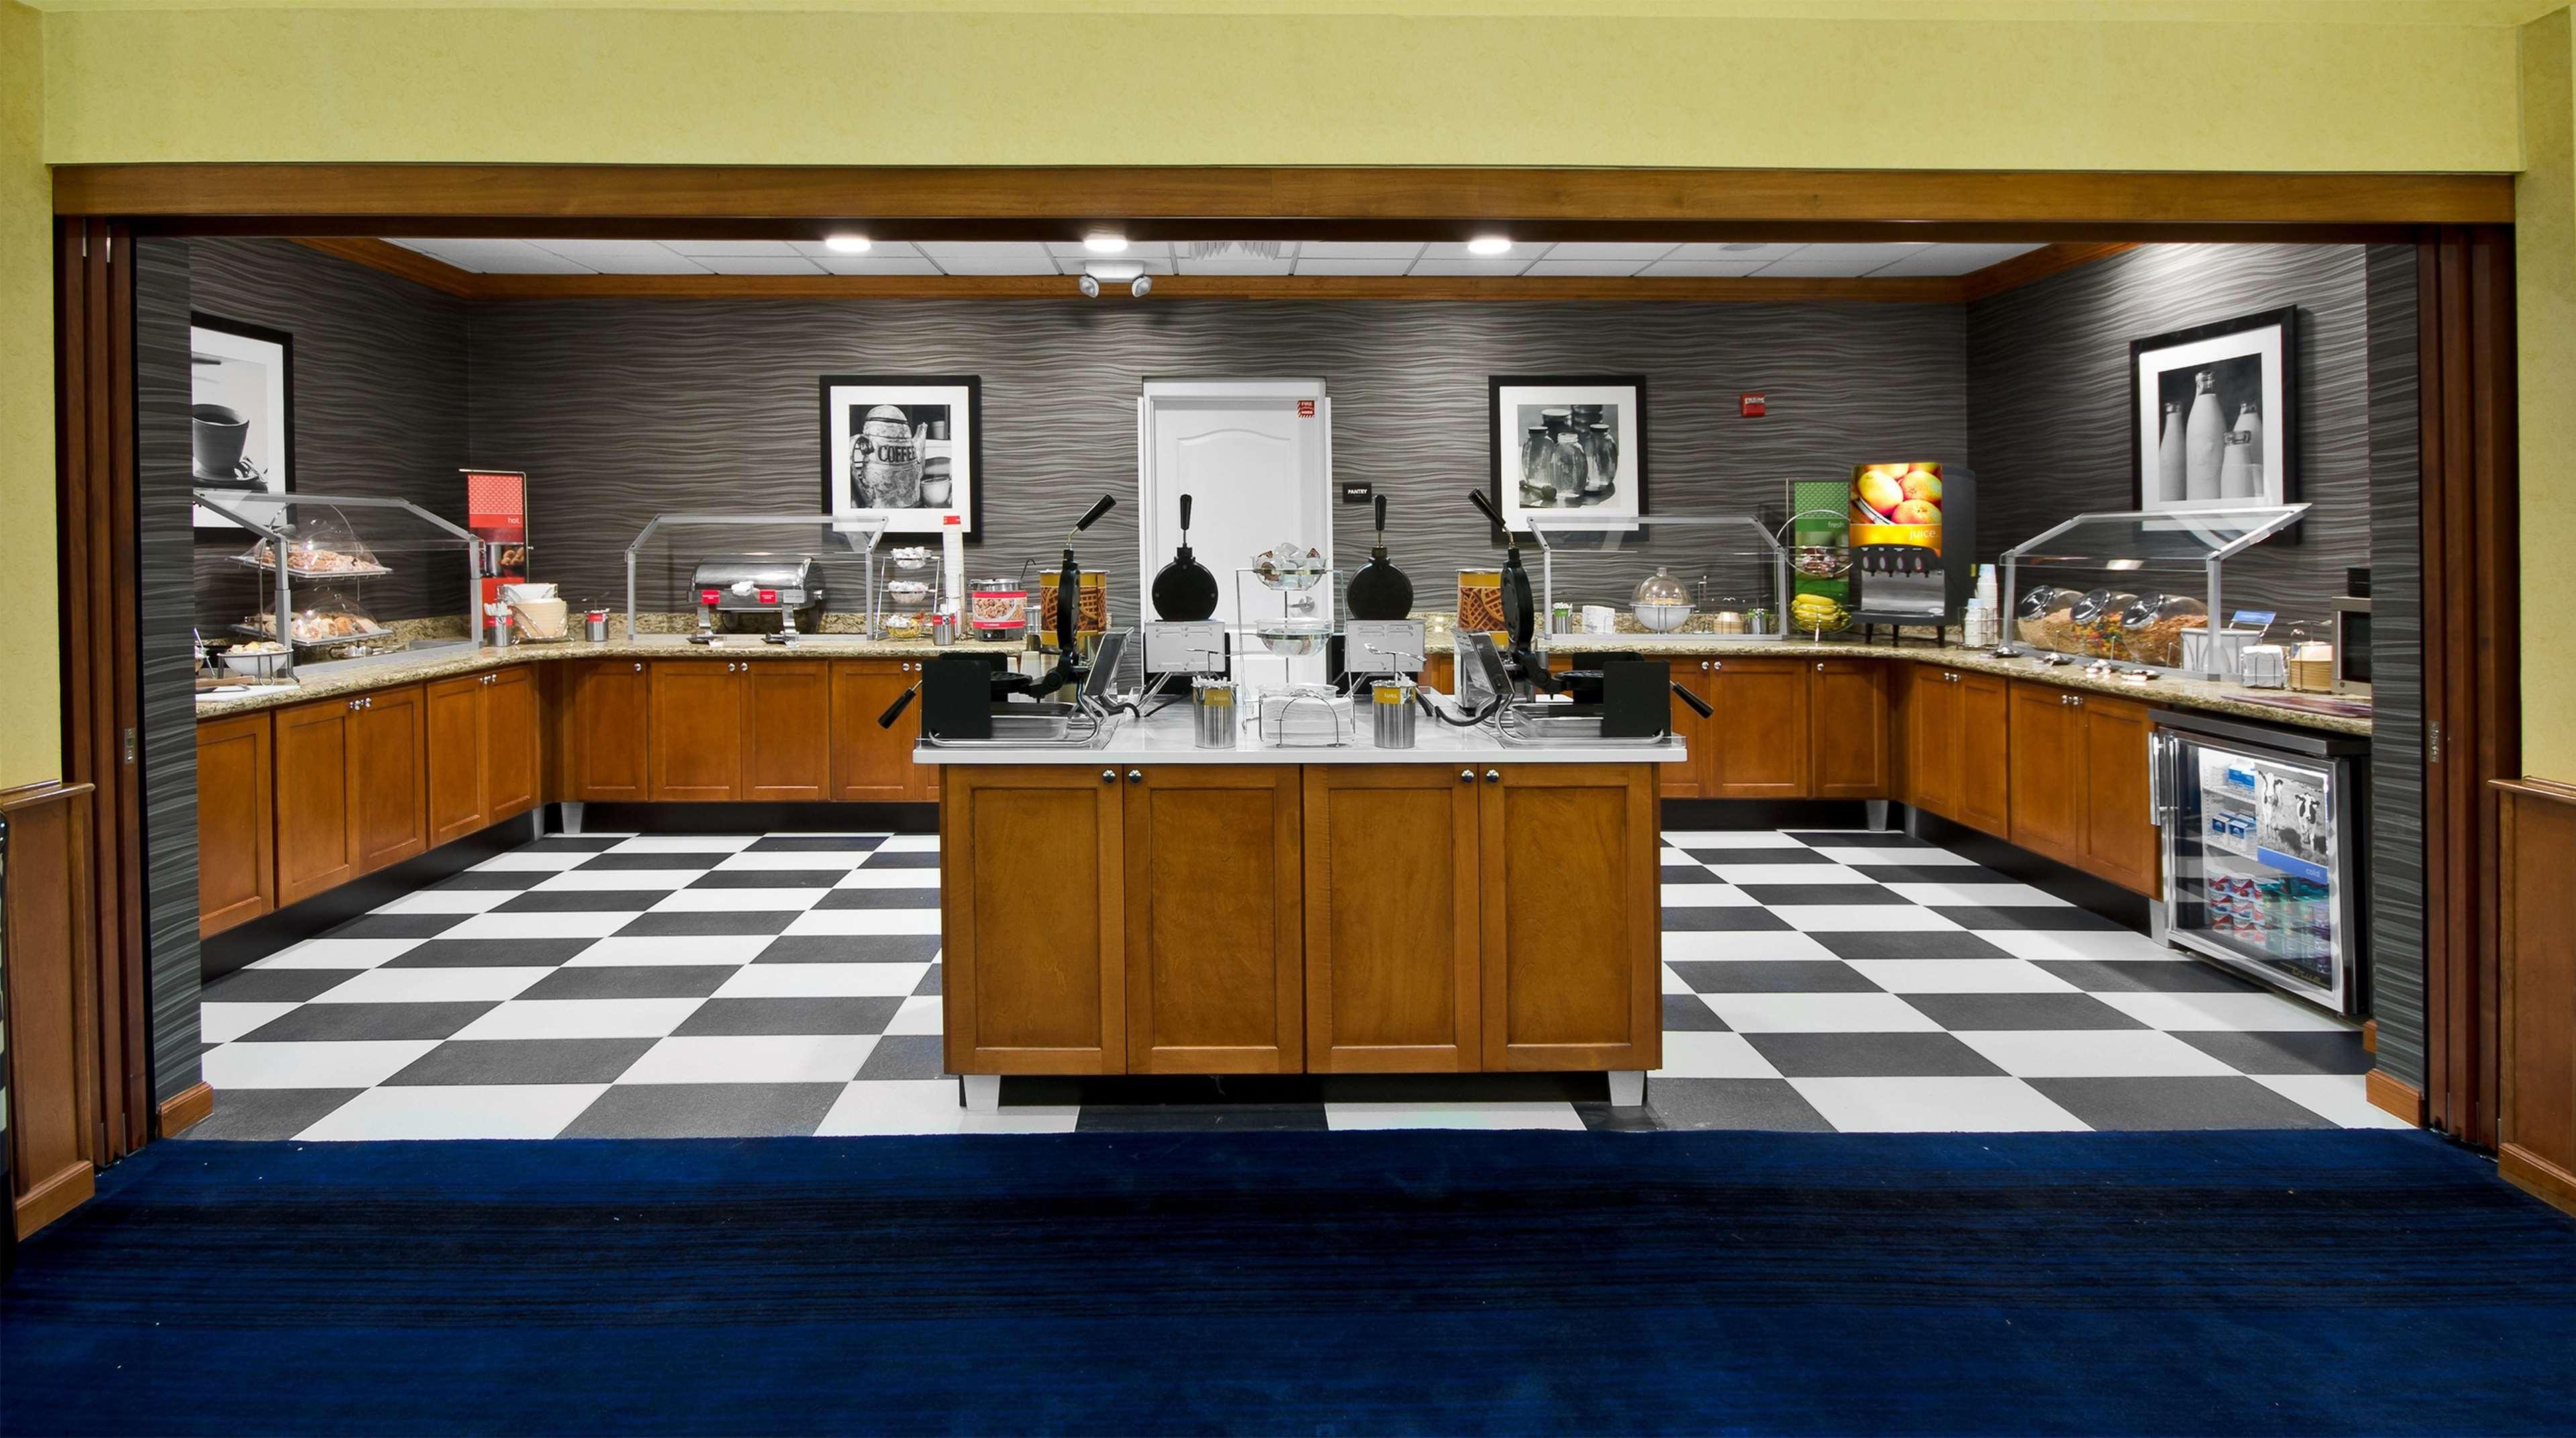 Hampton Inn & Suites Jacksonville South-St. Johns Town Center Area image 34